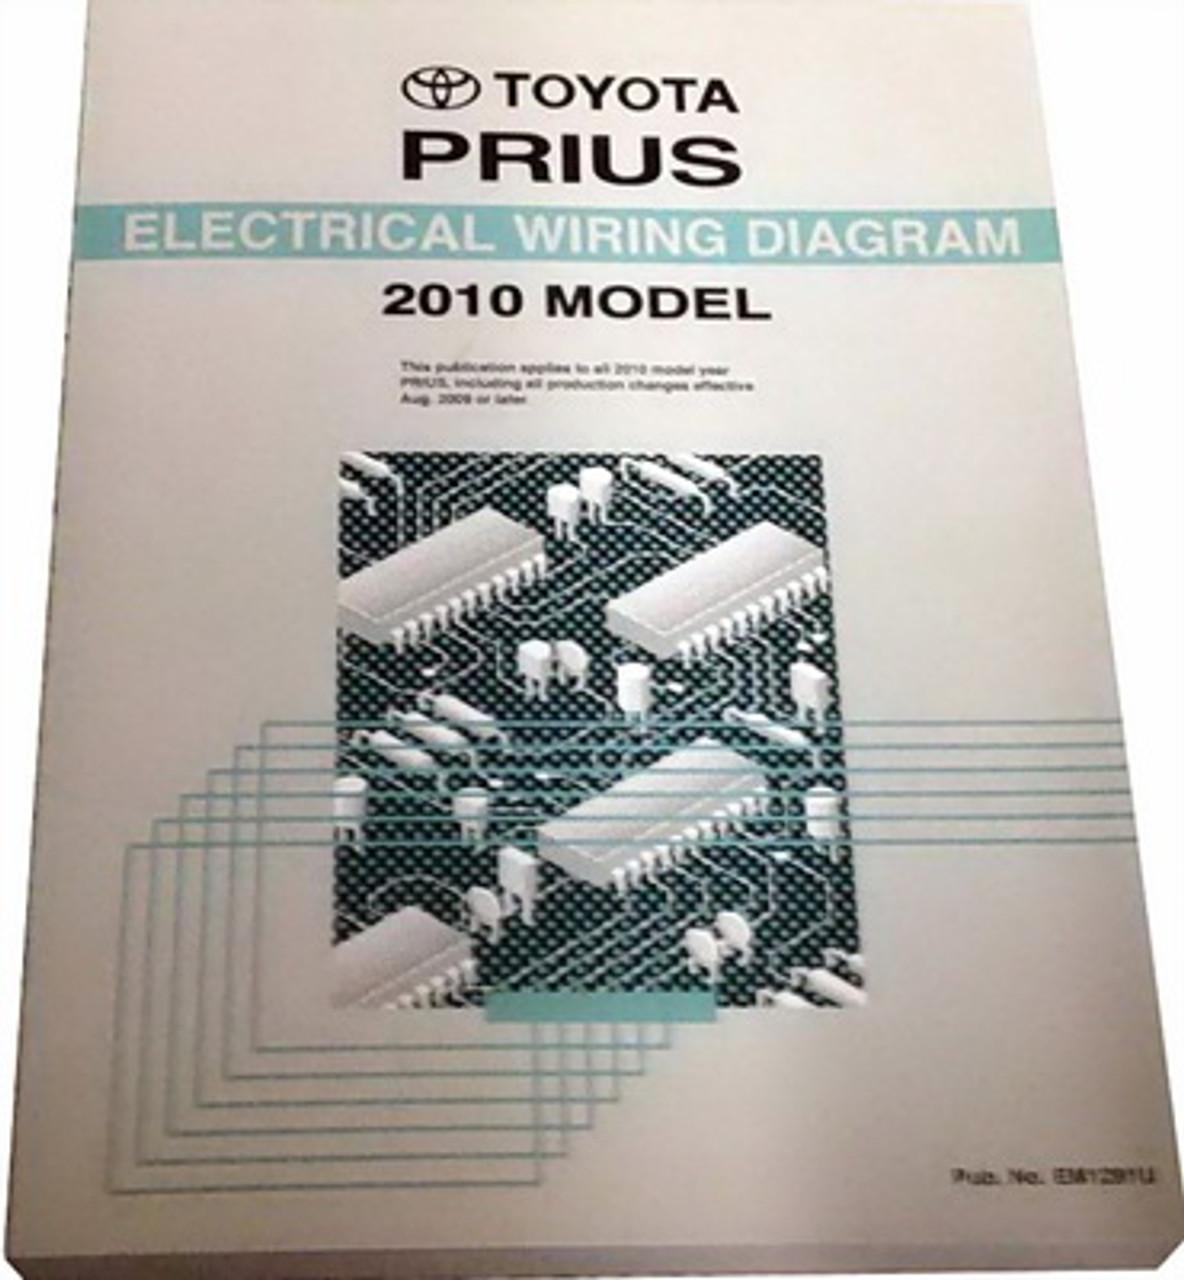 2010 toyota prius wiring diagram abs prius wiring diagrams wiring diagram e7  prius wiring diagrams wiring diagram e7